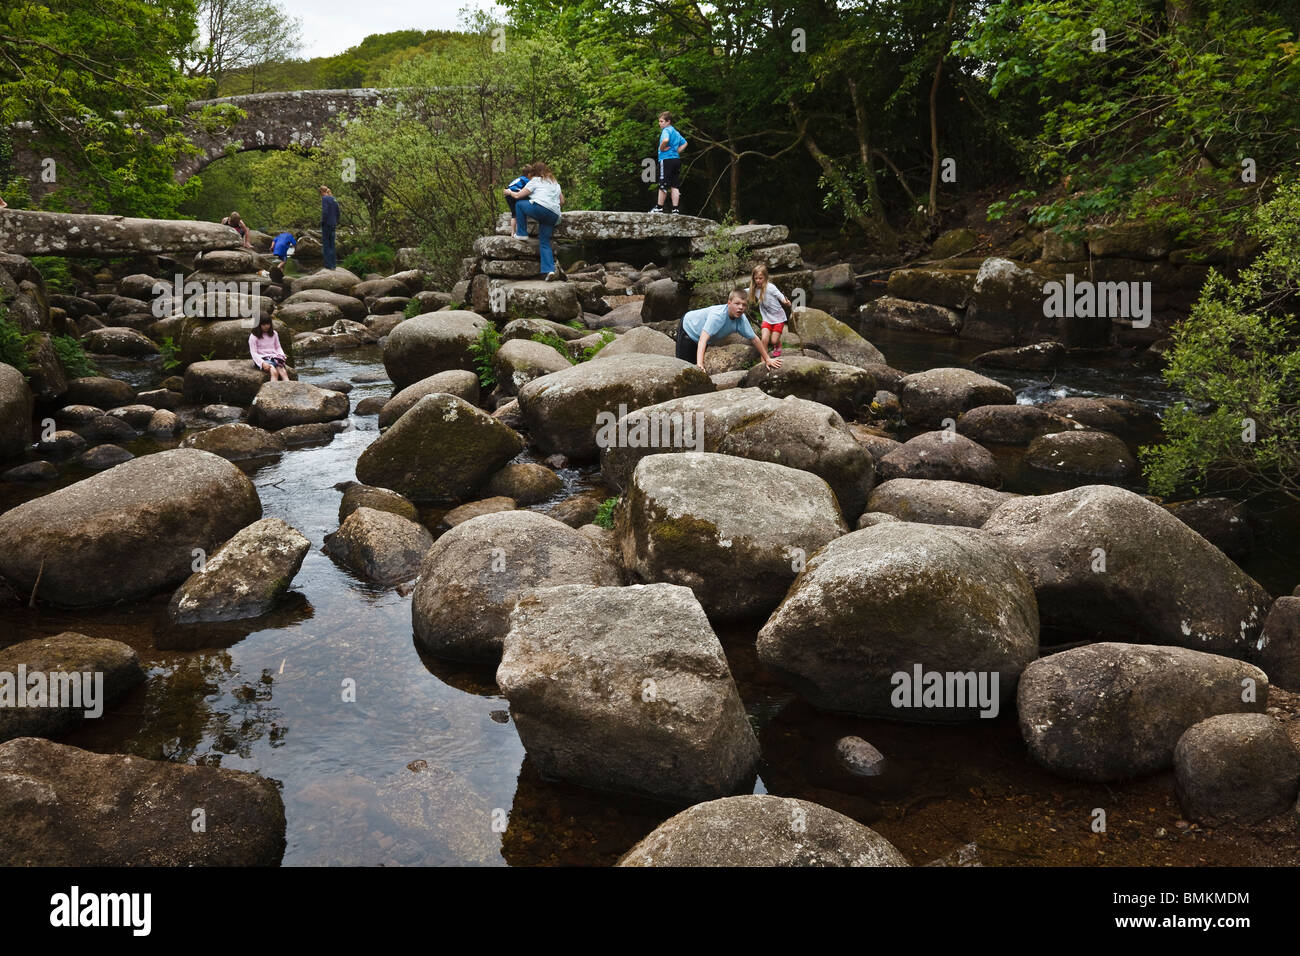 Clambering Over Rocks Stock Photos Amp Clambering Over Rocks